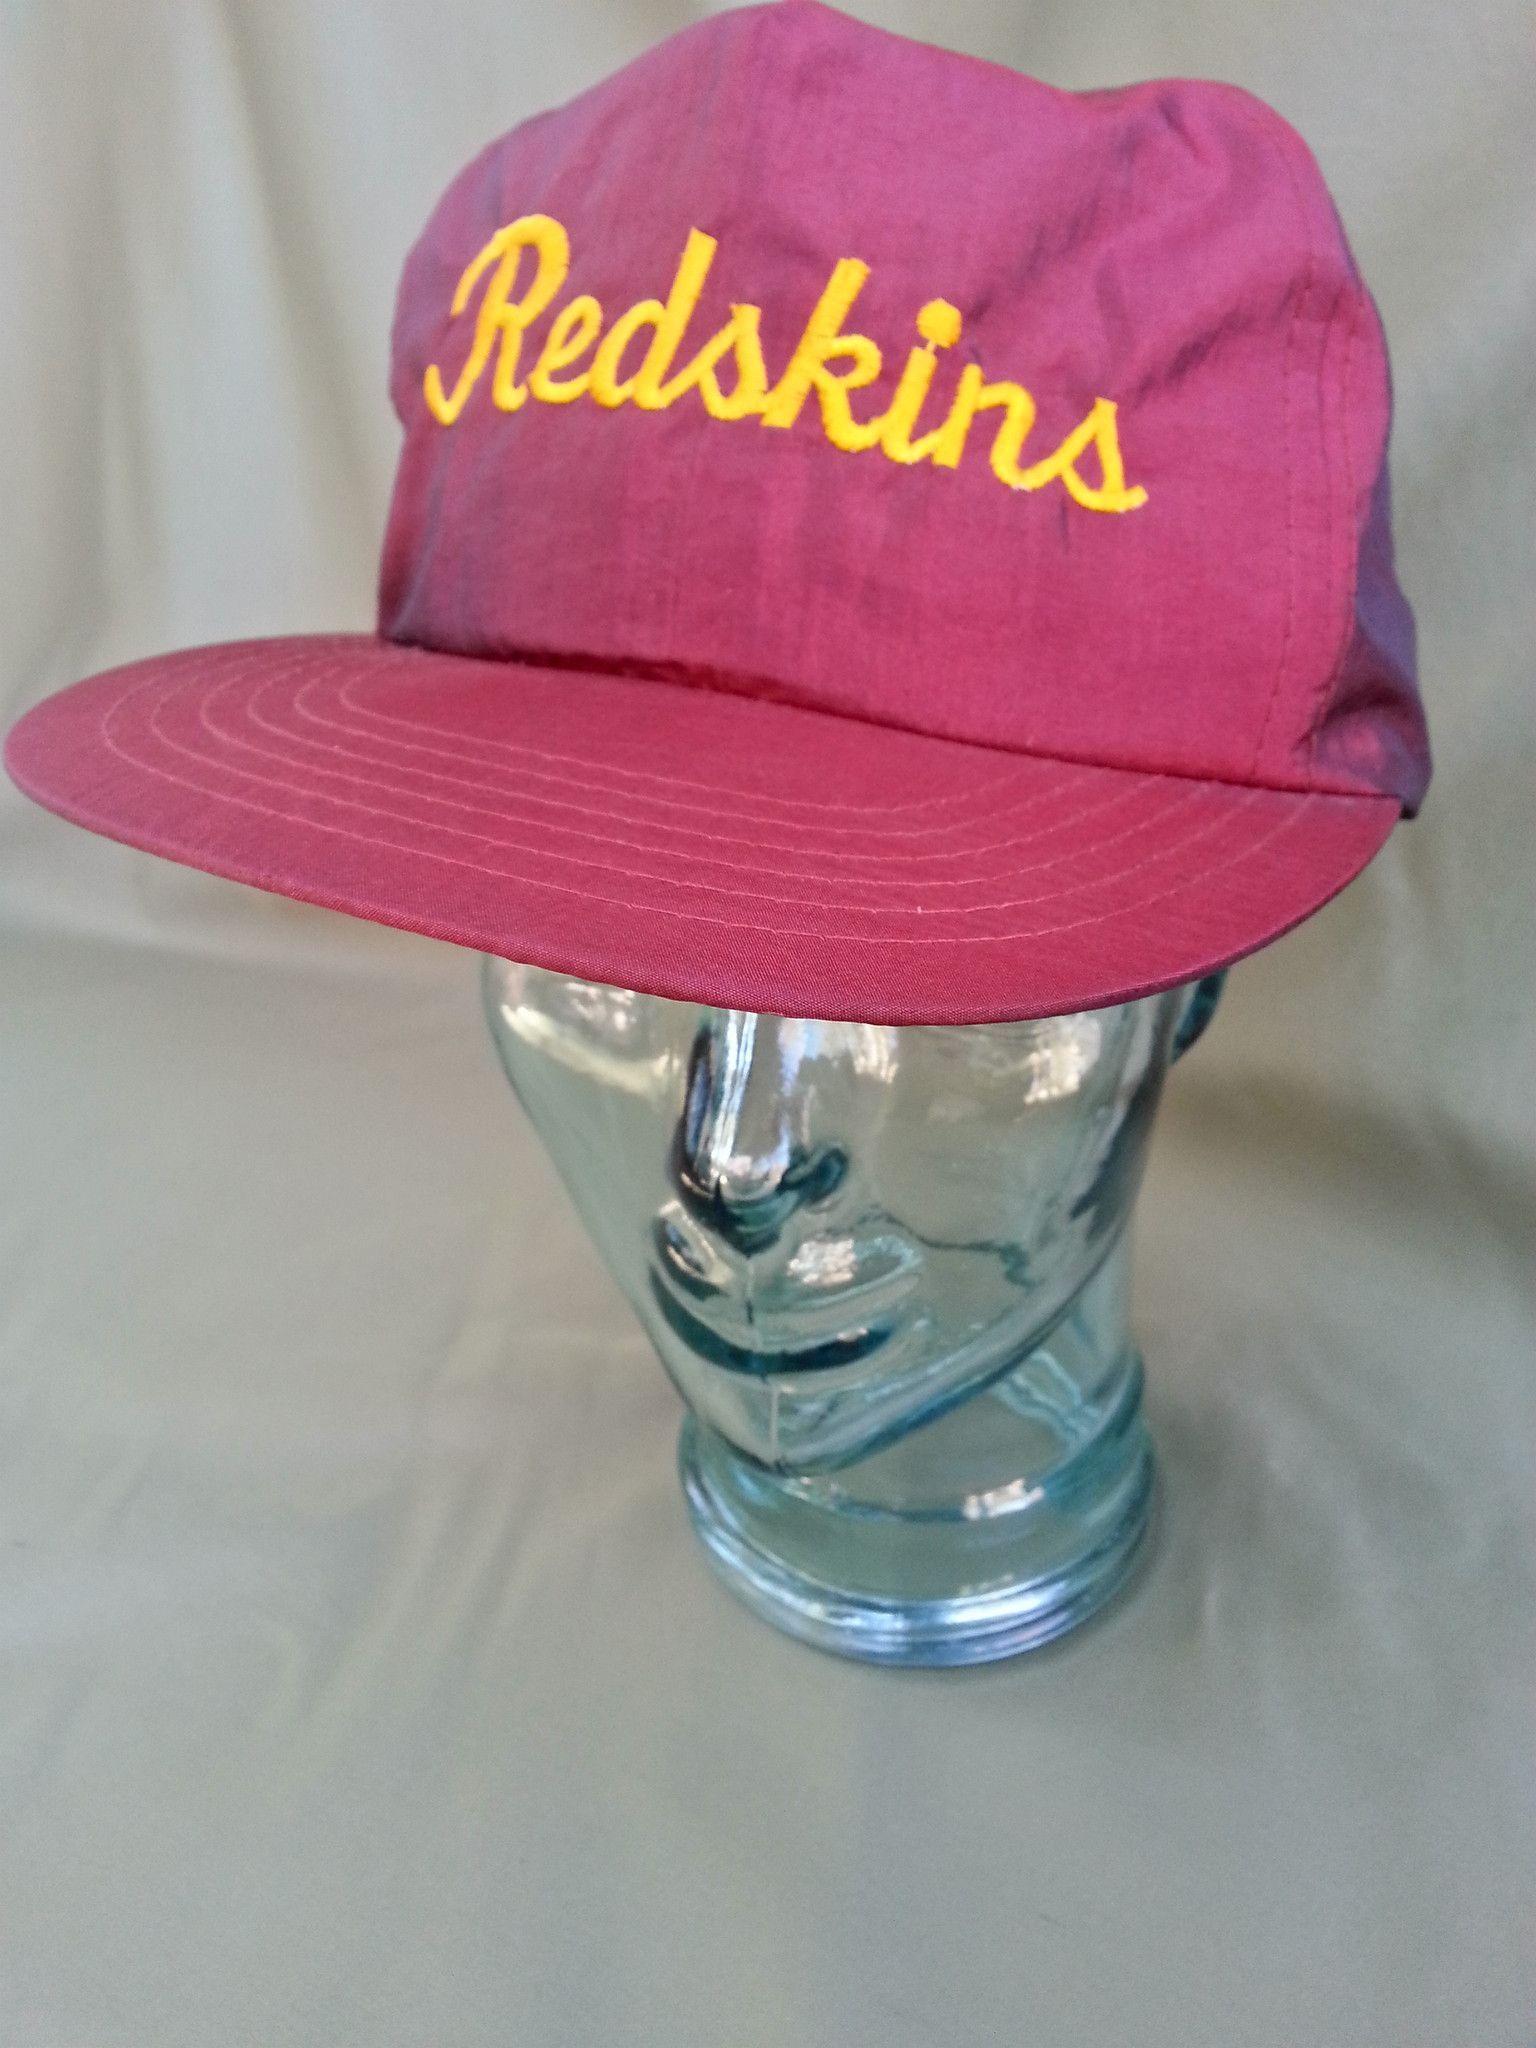 6d5252eb8b8b4 Washington Redskins Vintage 90s Snapback Hat